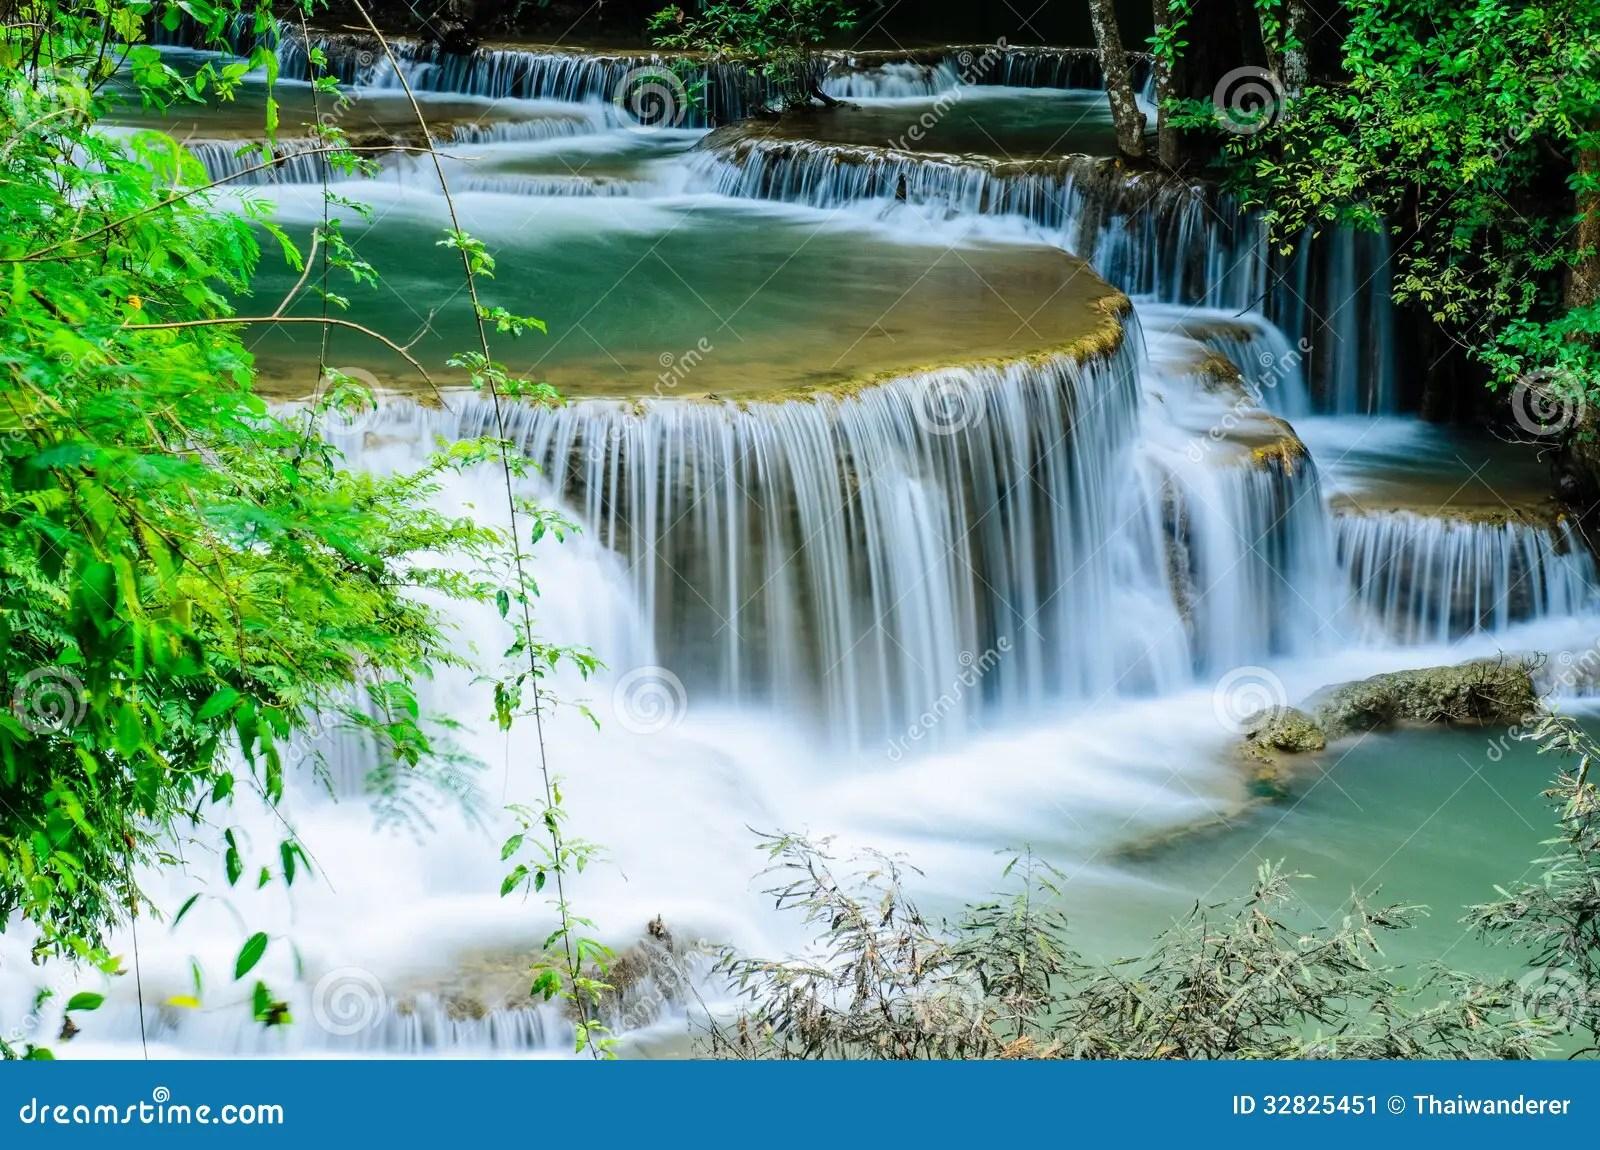 Falling Water Wallpaper Huay Mae Khamin Waterfall Flowing Water Paradise In